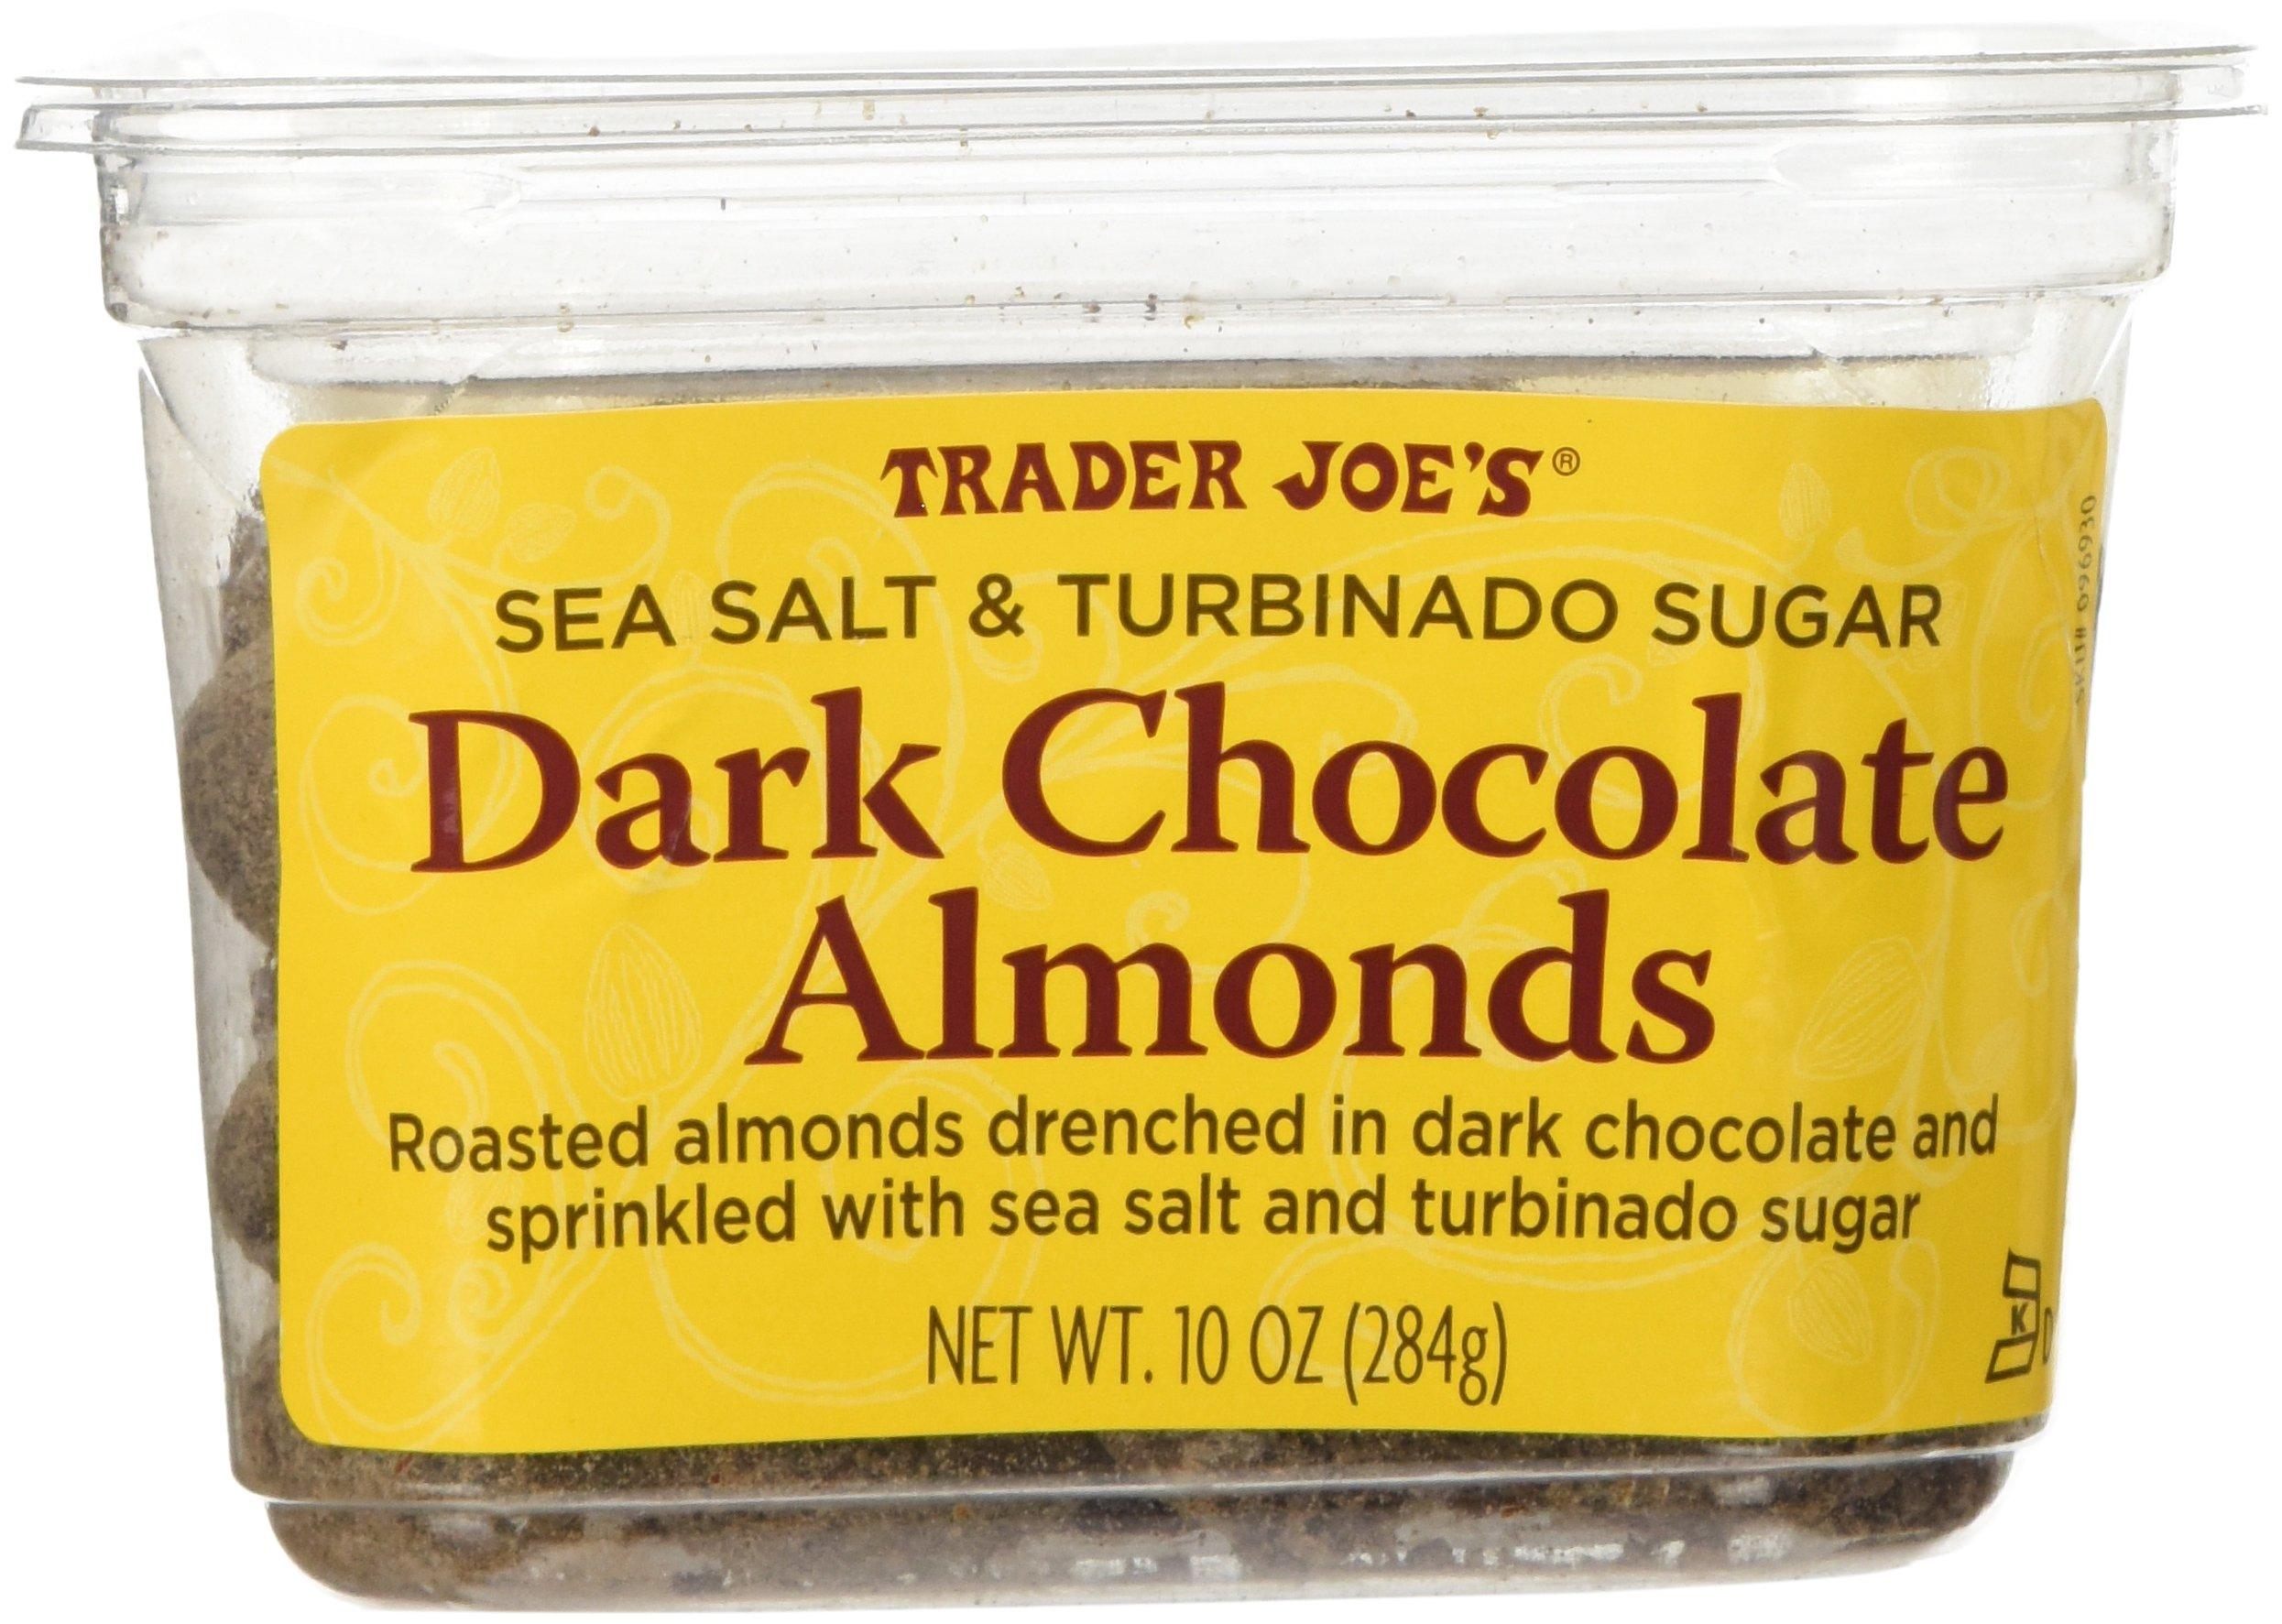 Trader Joe's Sea Salt & Turbinado Sugar Dark Chocolate Almonds 10 oz